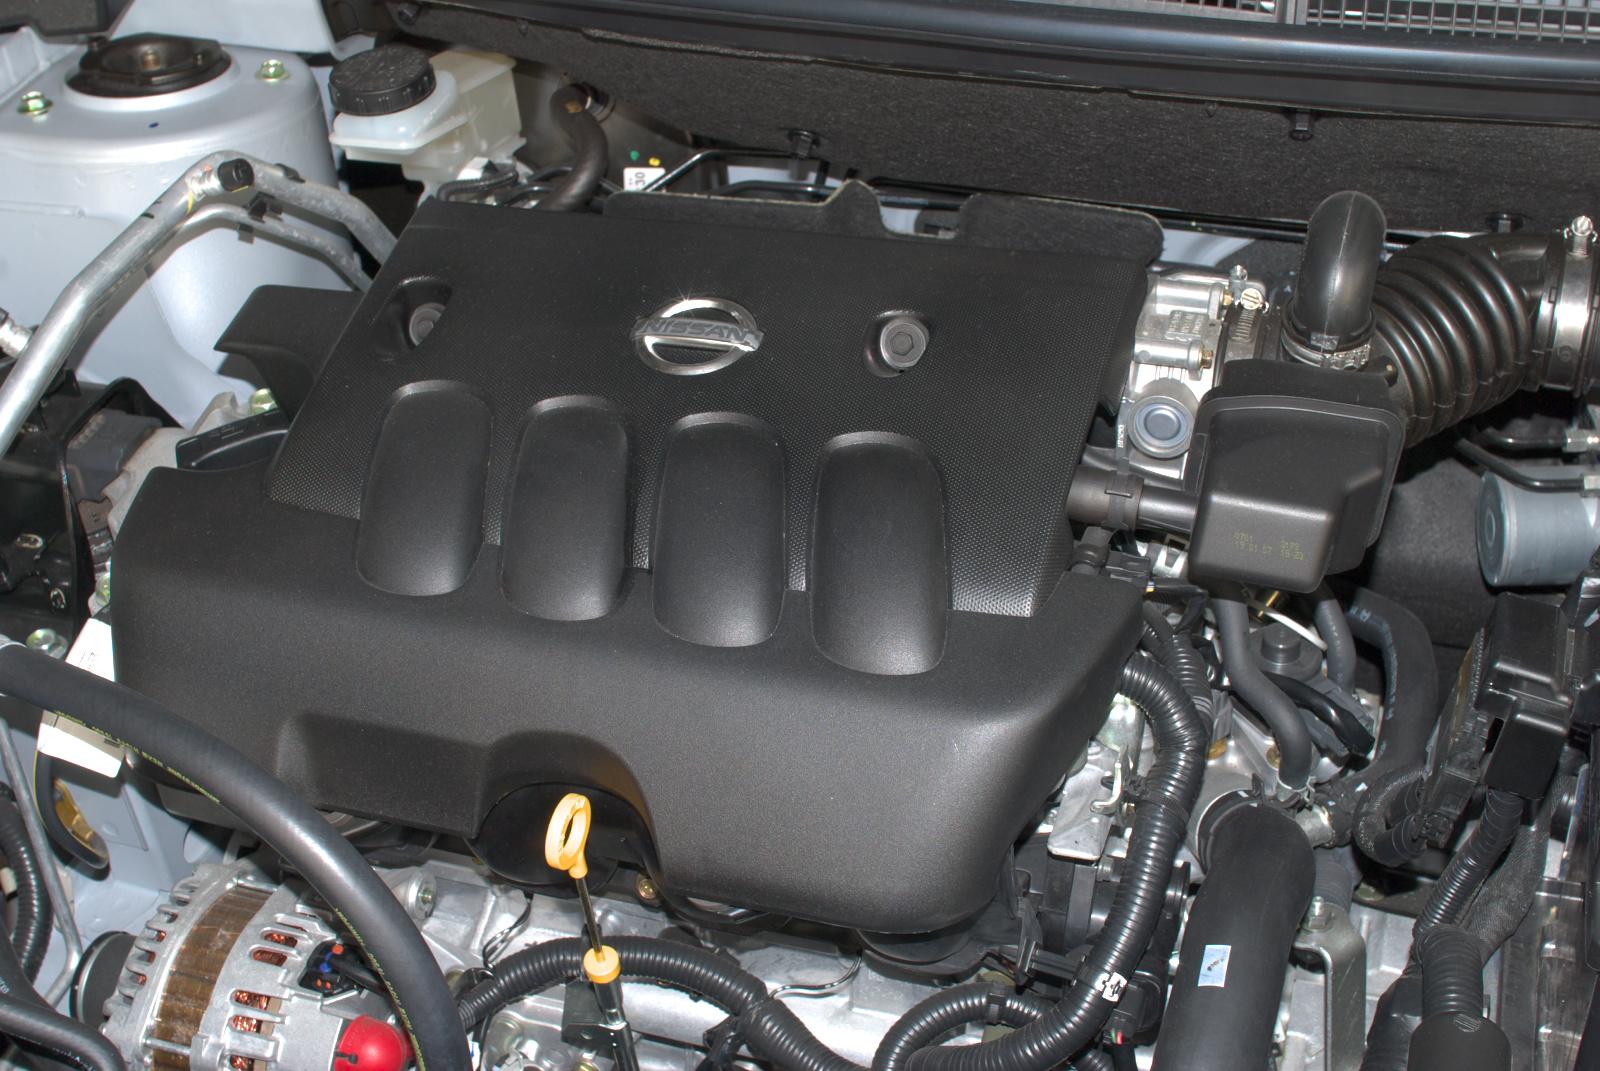 File Nissan Mr20de Engine Jpg Wikimedia Commons